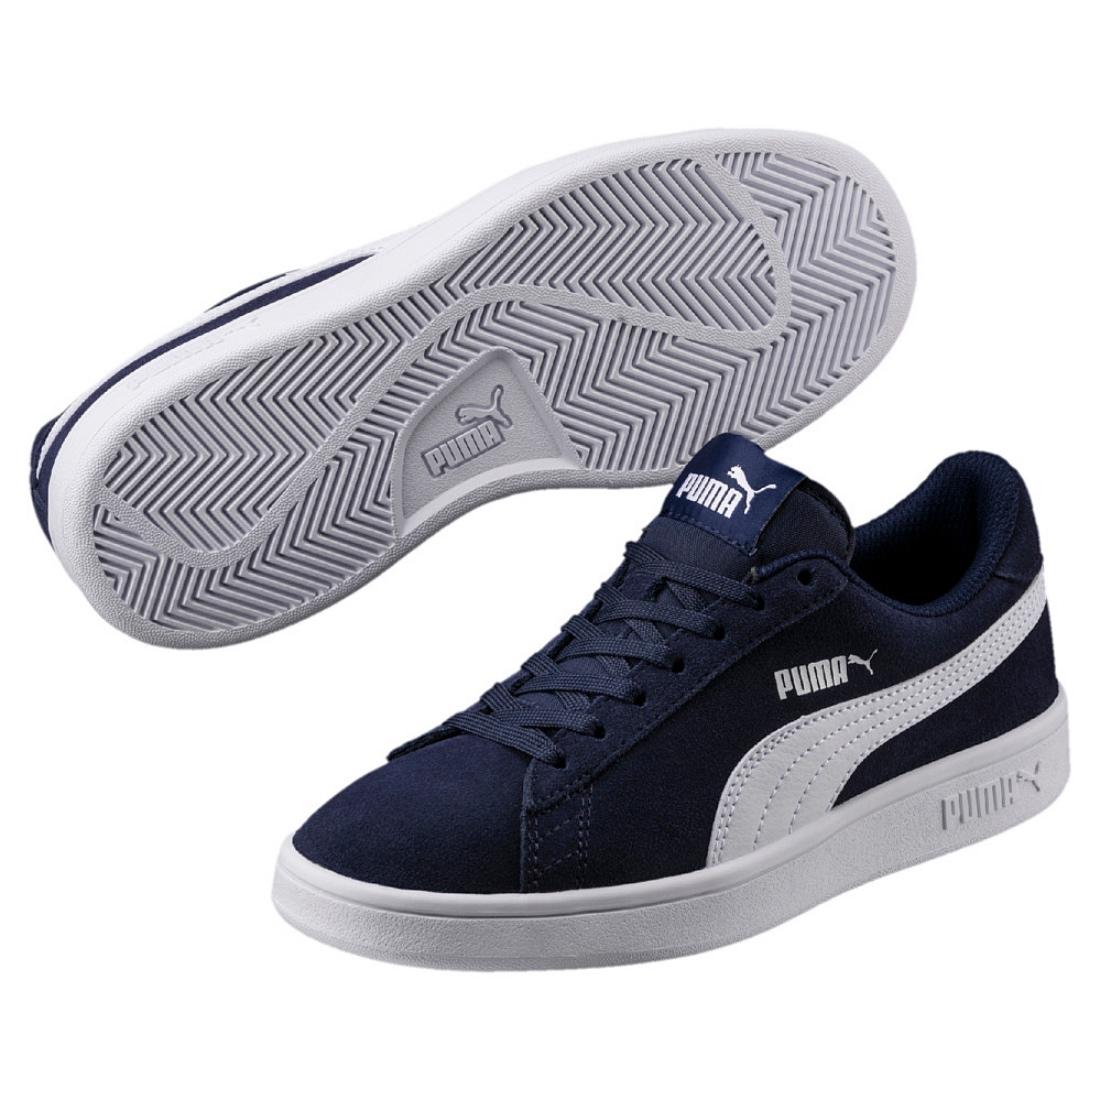 346a0216b45 Puma Smash V2 SD Jr Low-Top Unisex Children Women s Shoe Sneaker ...